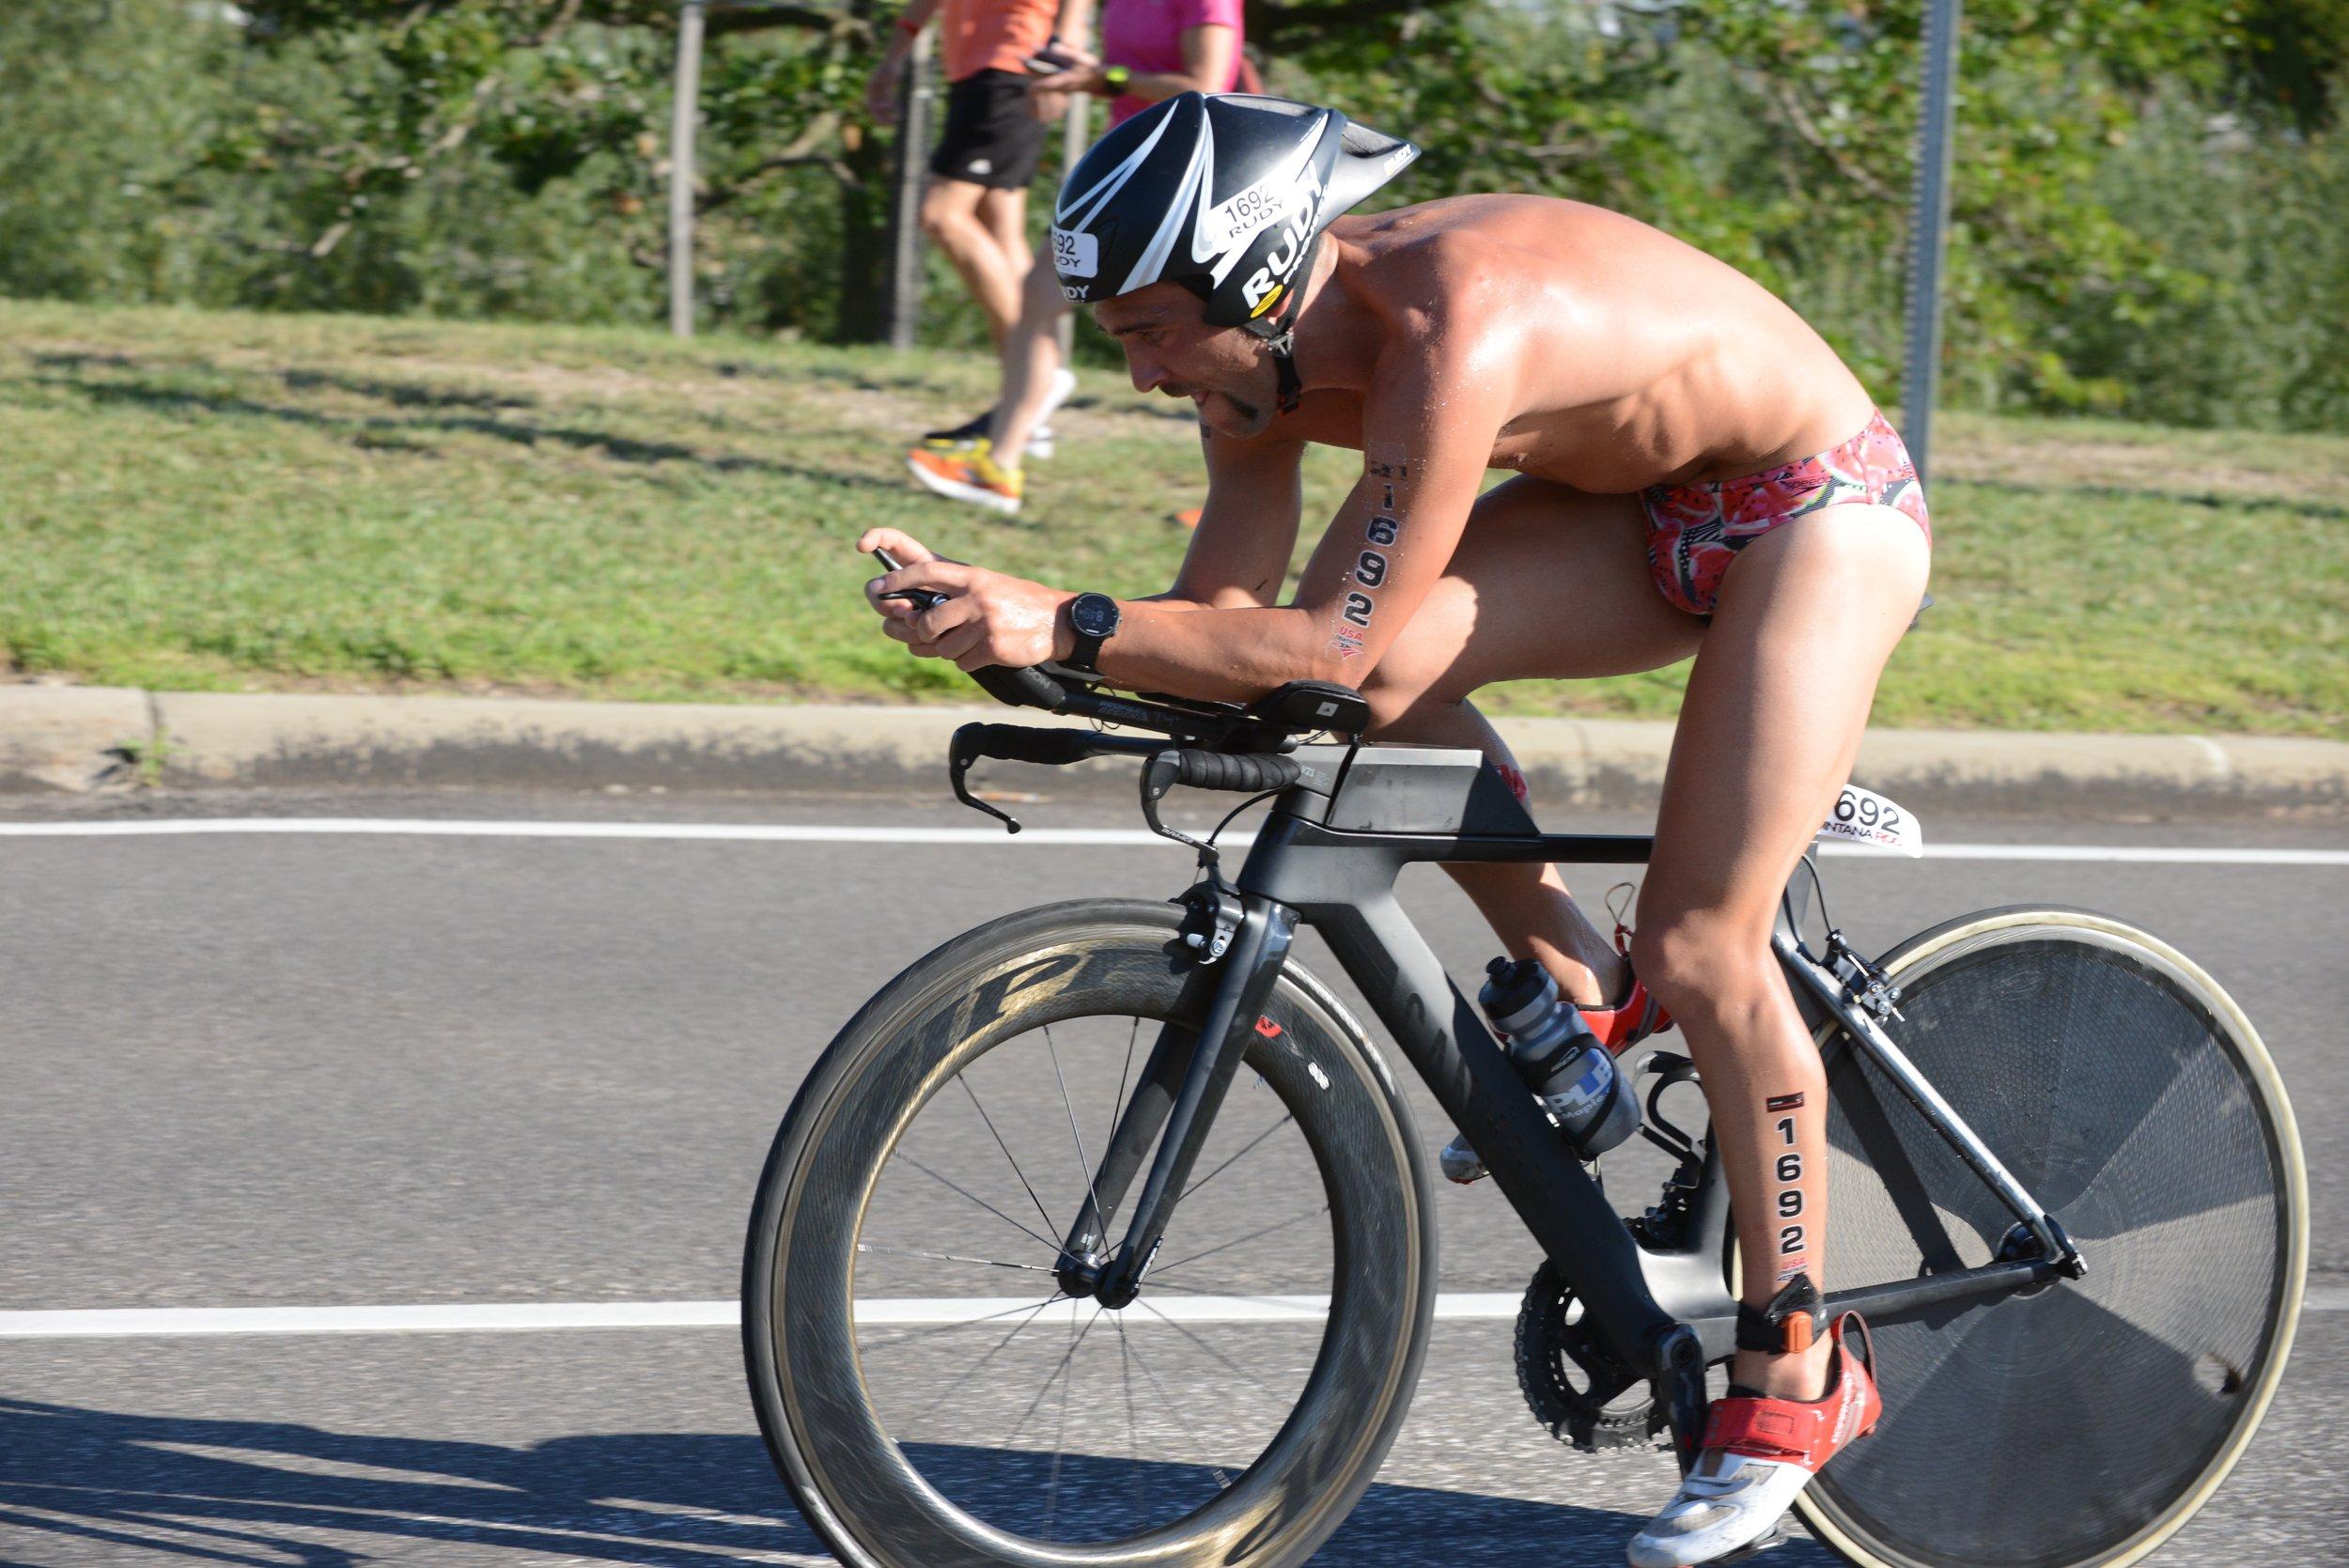 4th fastest bike split of the day proves that #skinisthemostaero